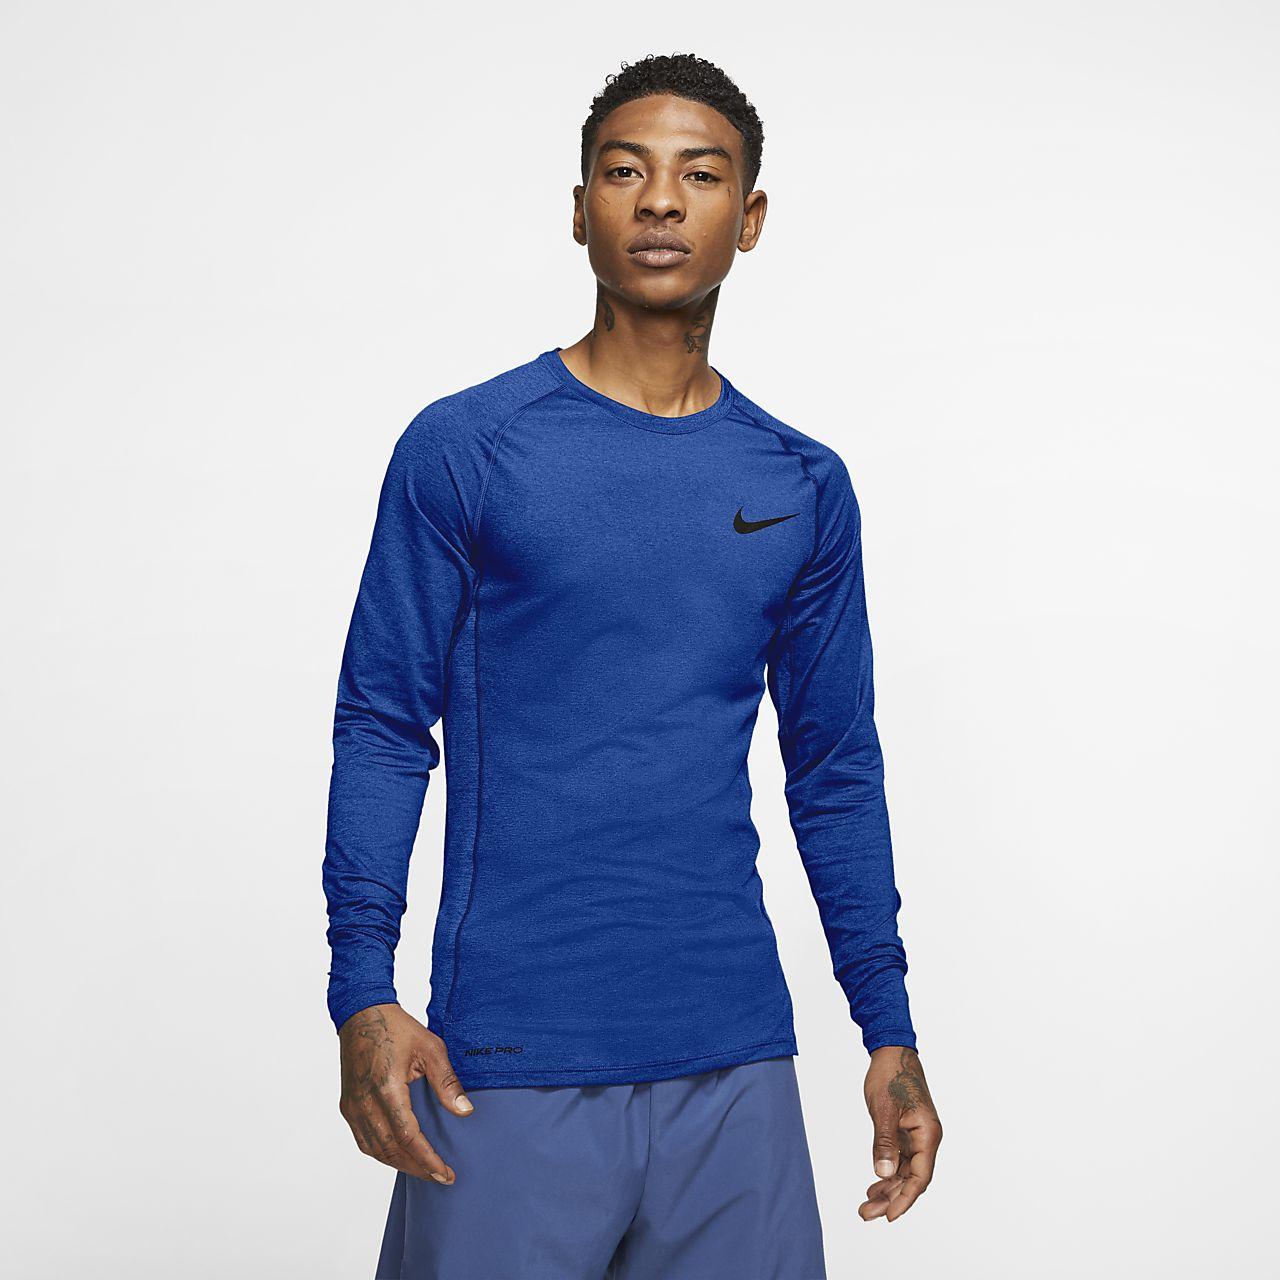 Nike Pro Camiseta de manga larga y ajuste ceñido - Hombre